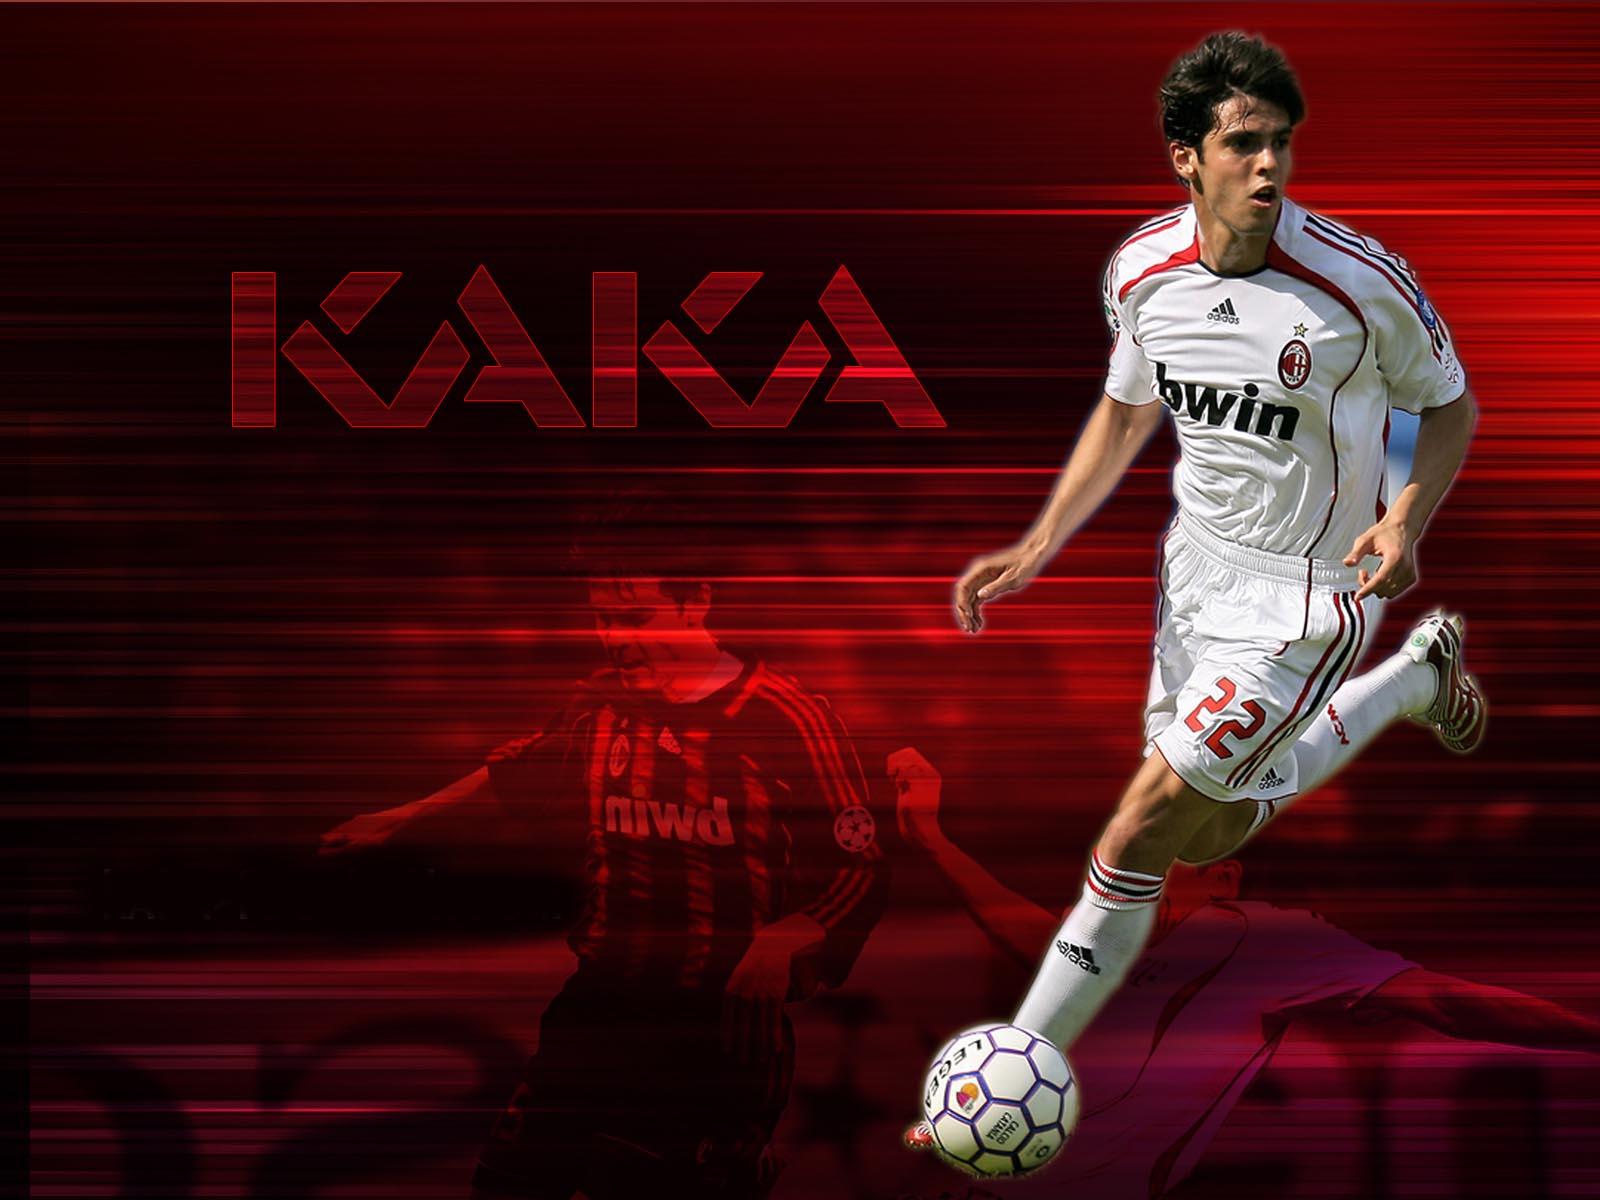 Kaka Real Madrid CF Mac HD Wallpaper Wallpaper 1600x1200